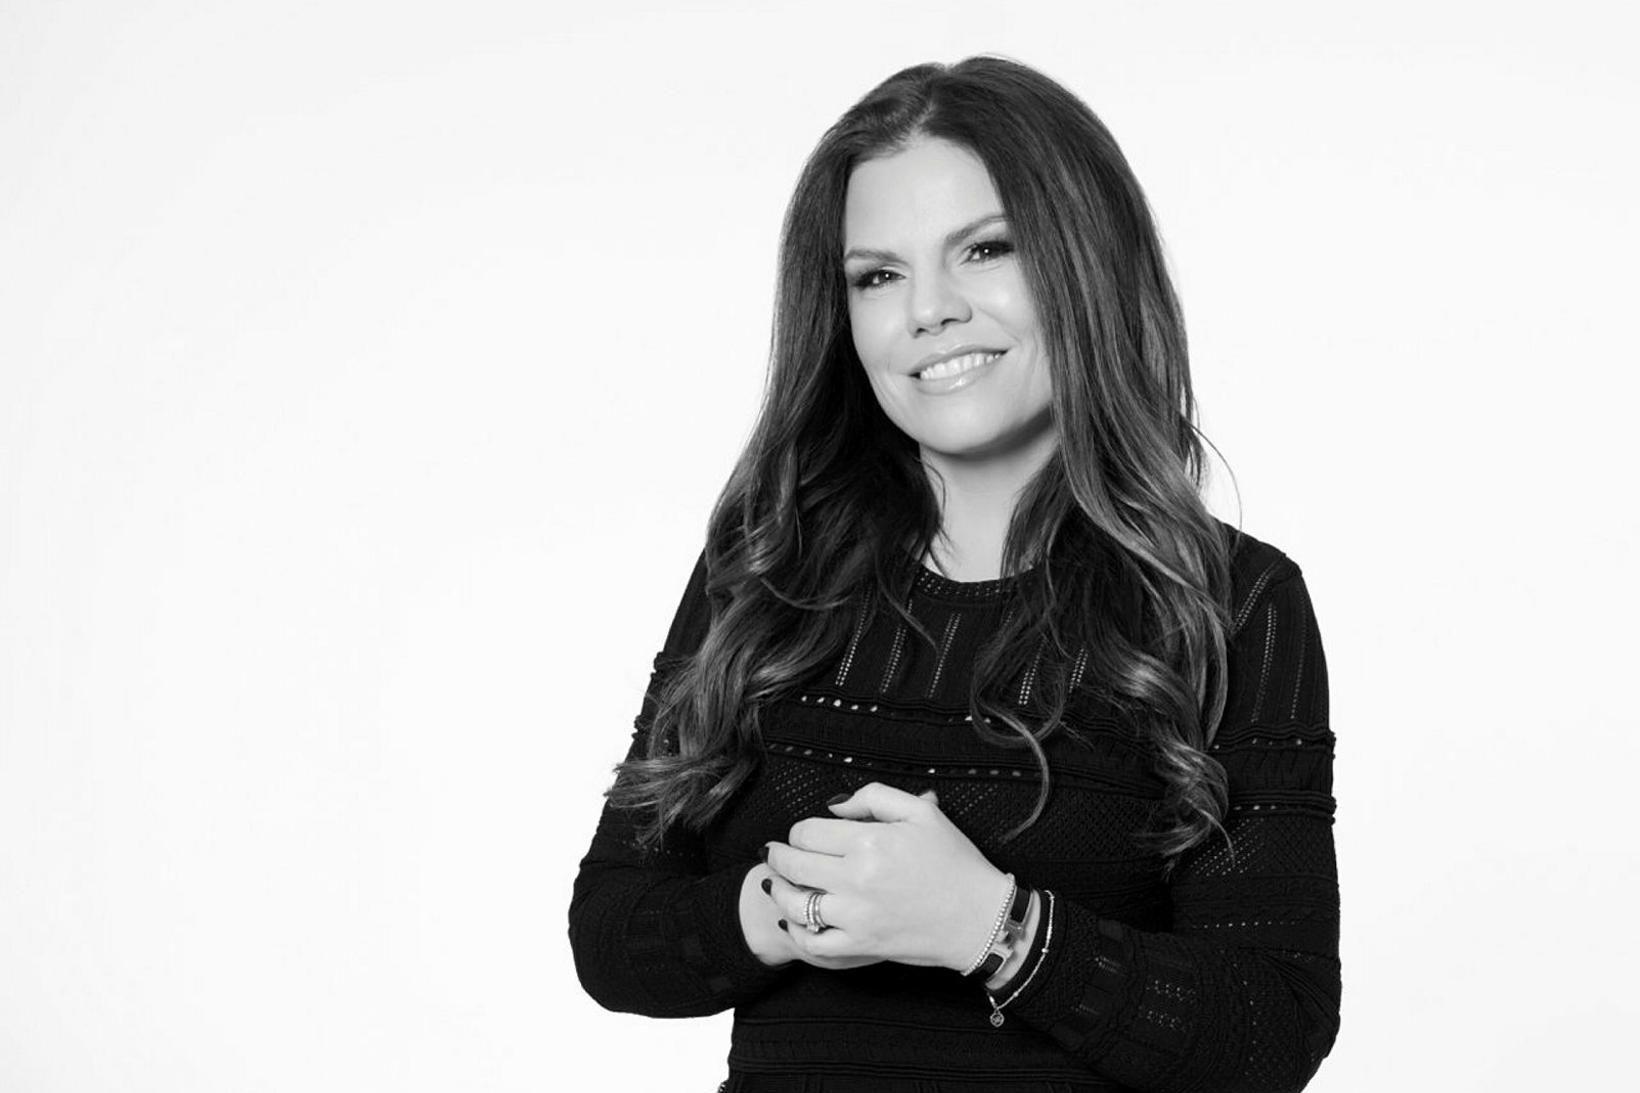 Marta María Jónasdóttir fréttastjóri dægurmála mbl.is.